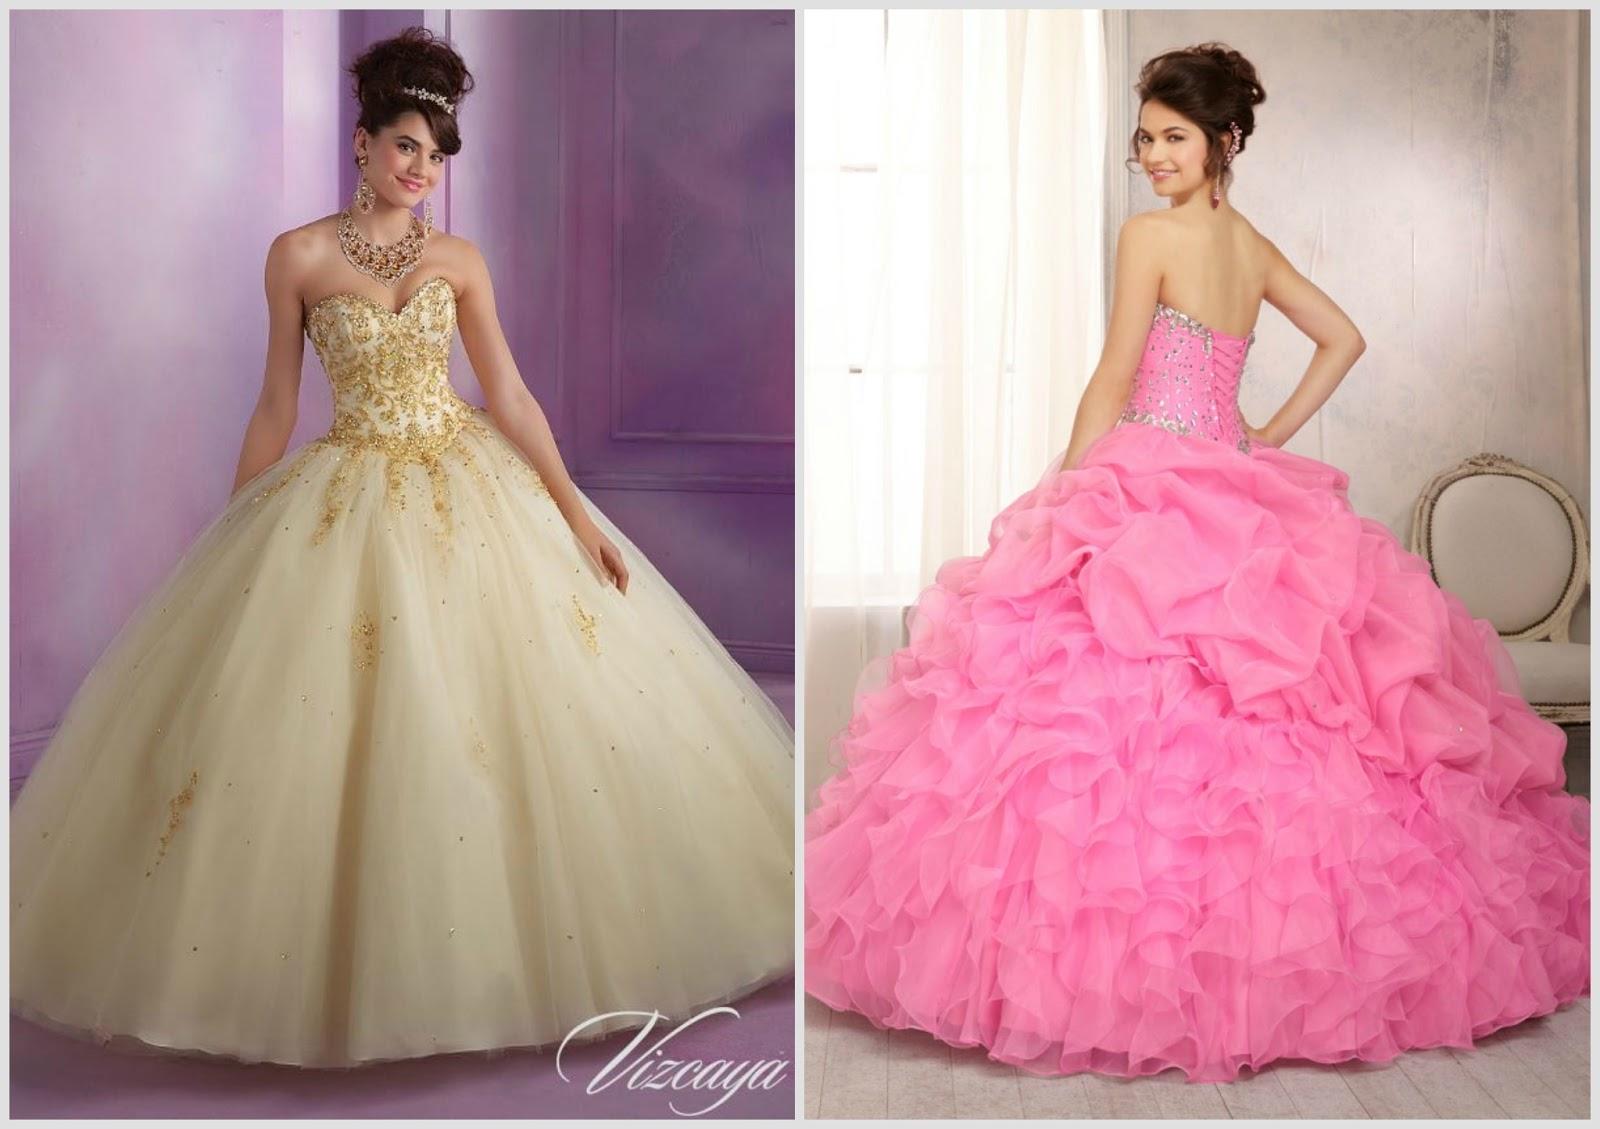 072b9e9afaa Quinceanera Minerva s. Brides of America Online Store  October 2015